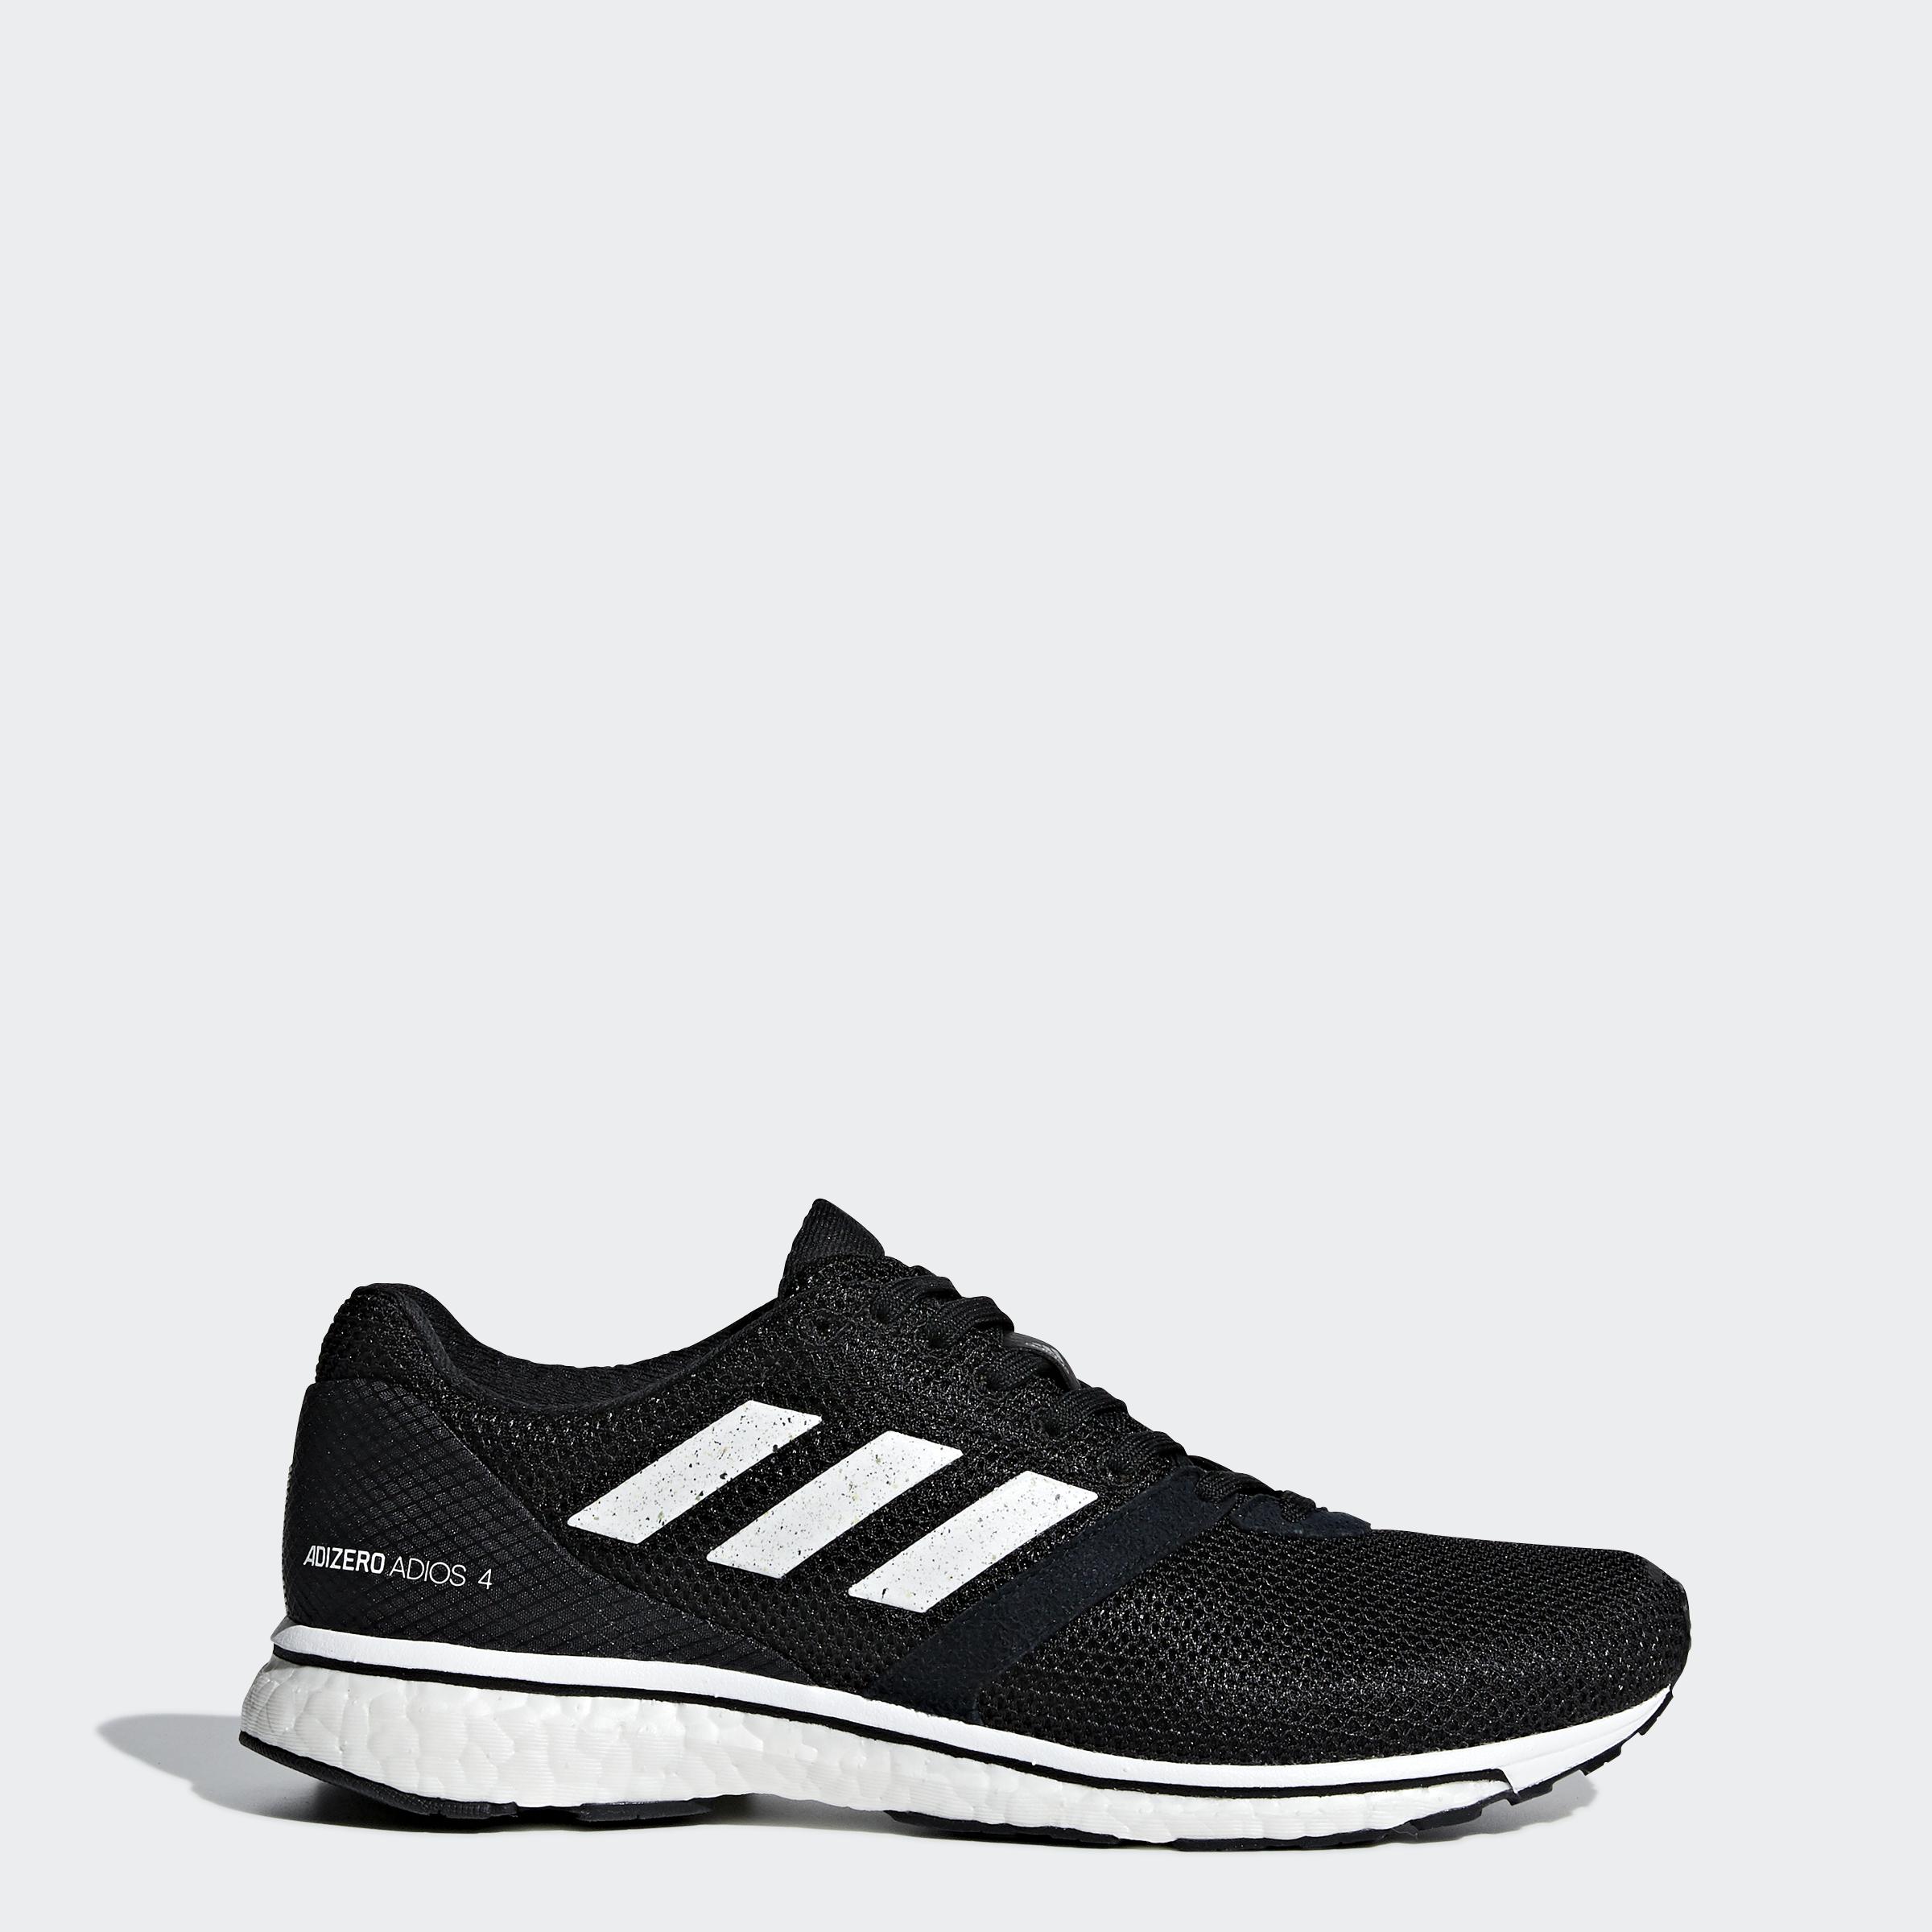 Details about adidas Adizero Adios 4 Shoes Women's